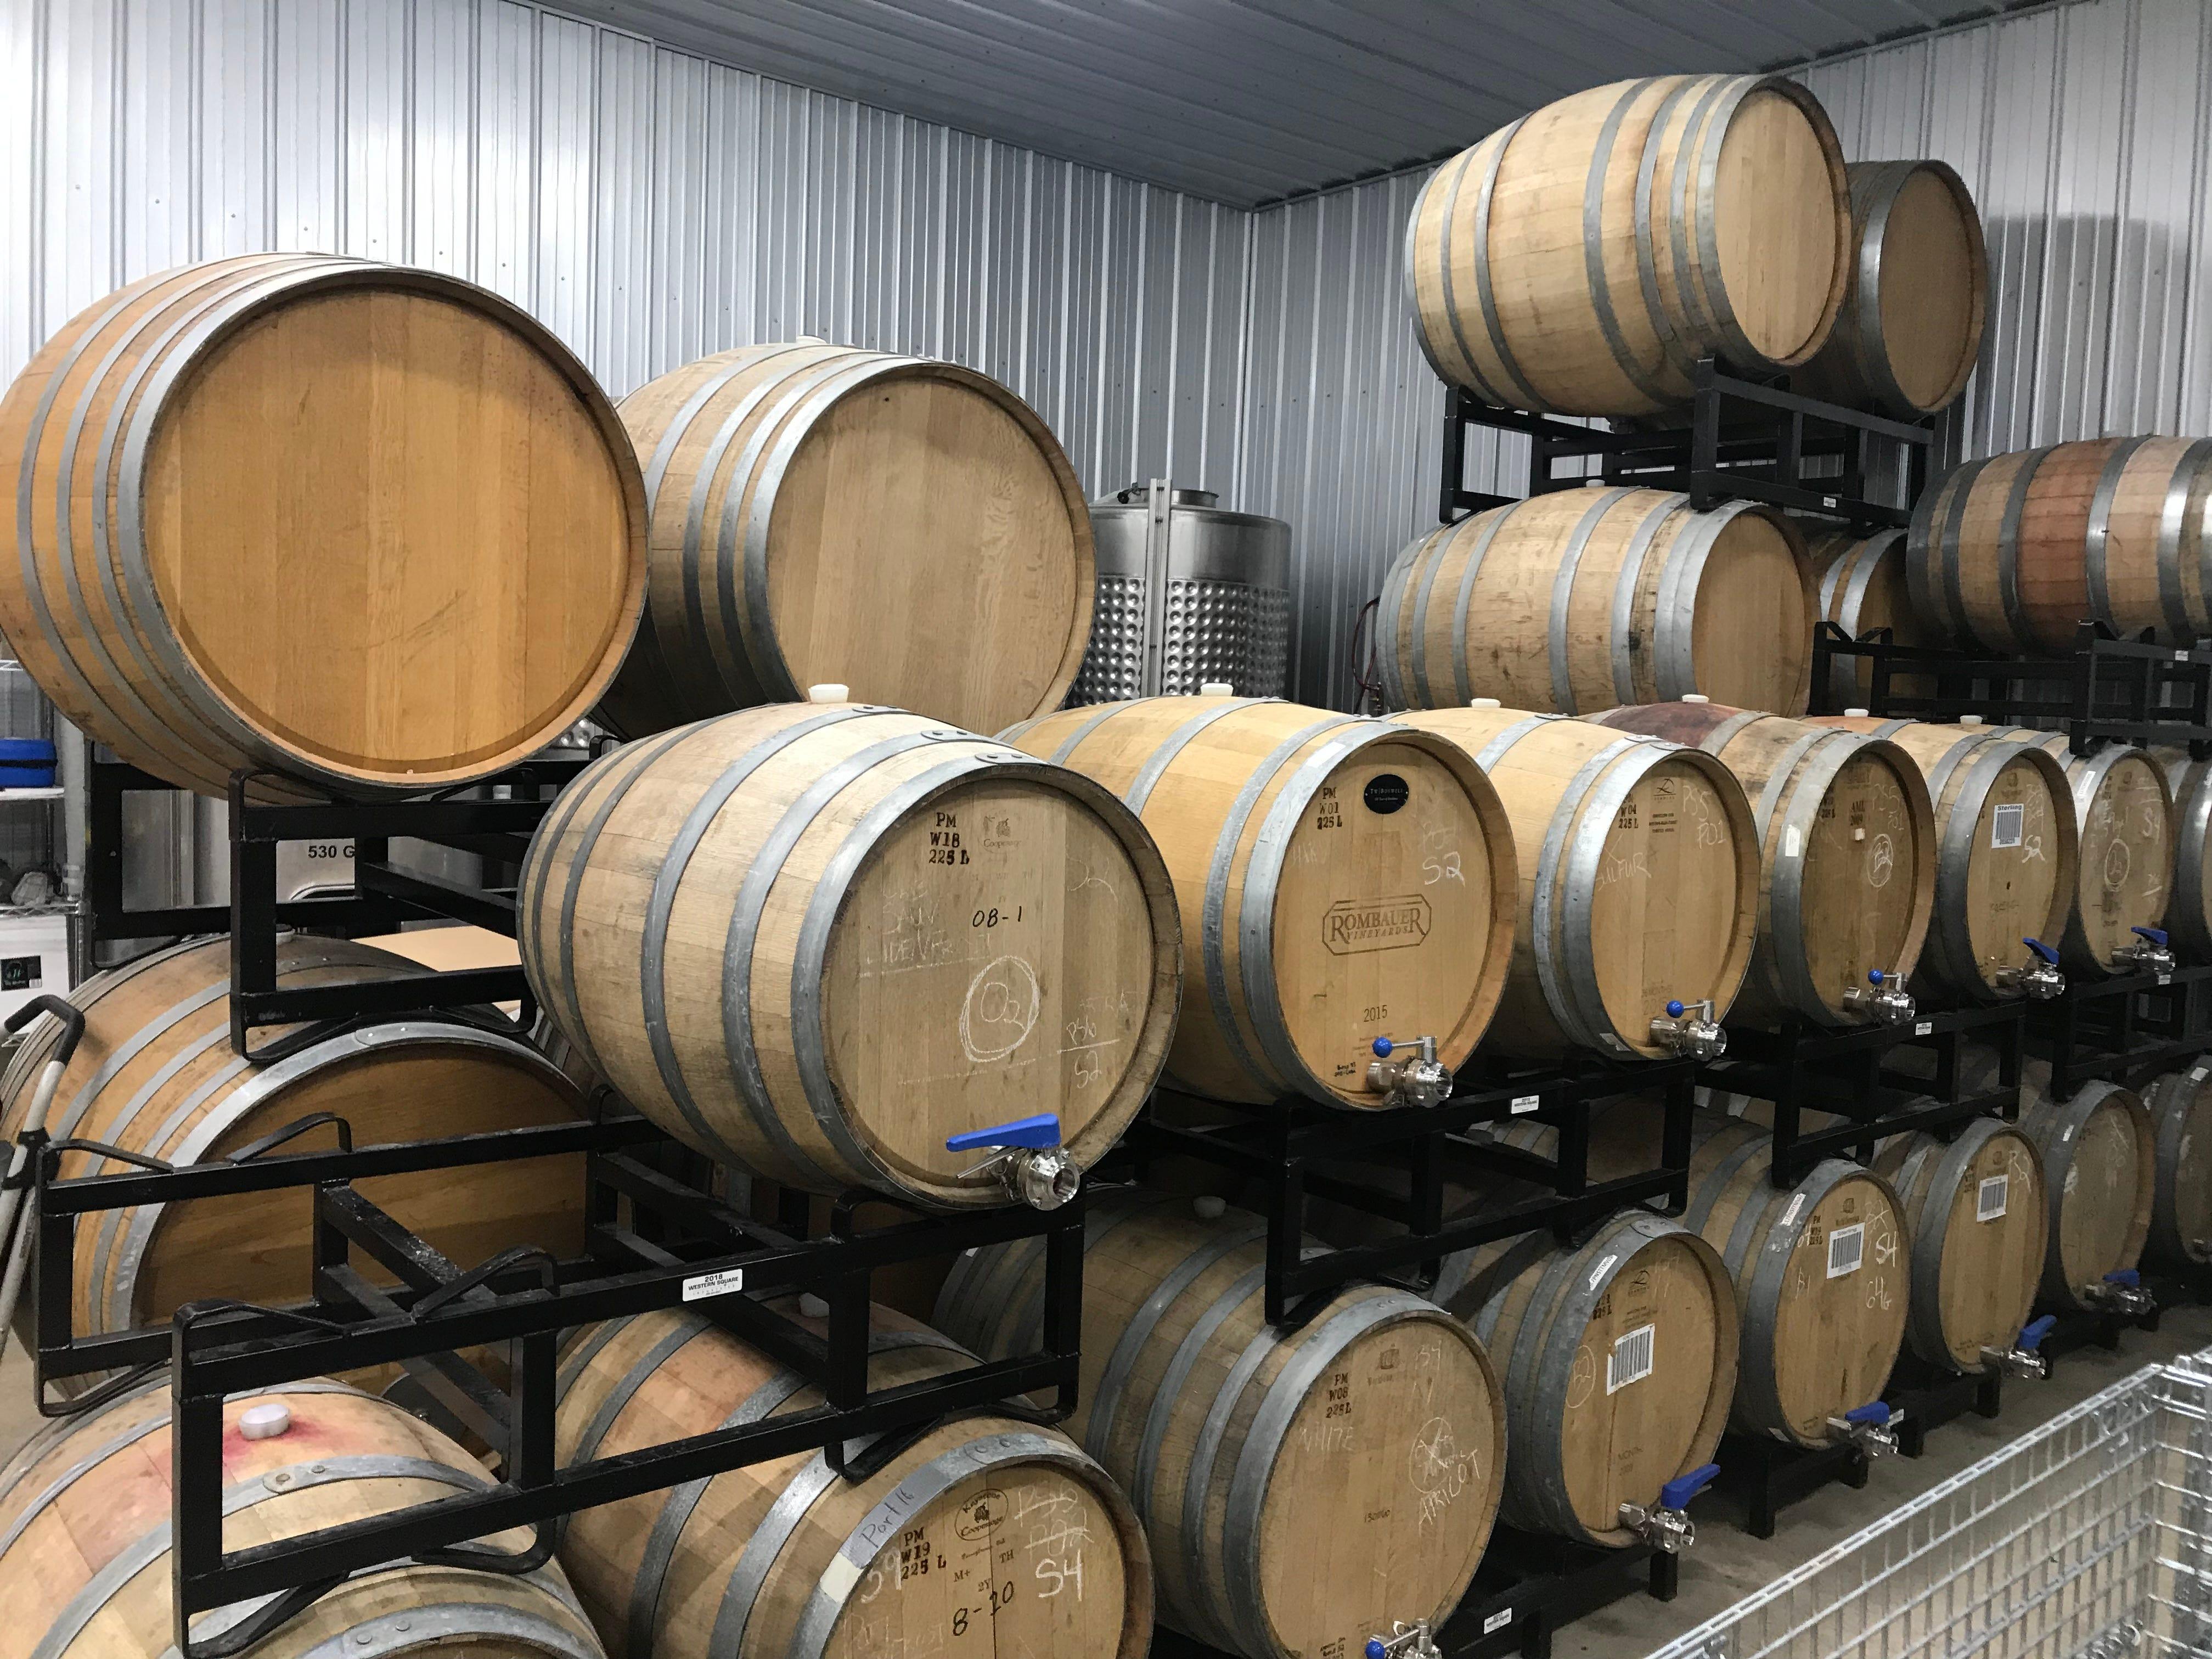 The burgeoning barrel collection at Pantomime Mixtures.